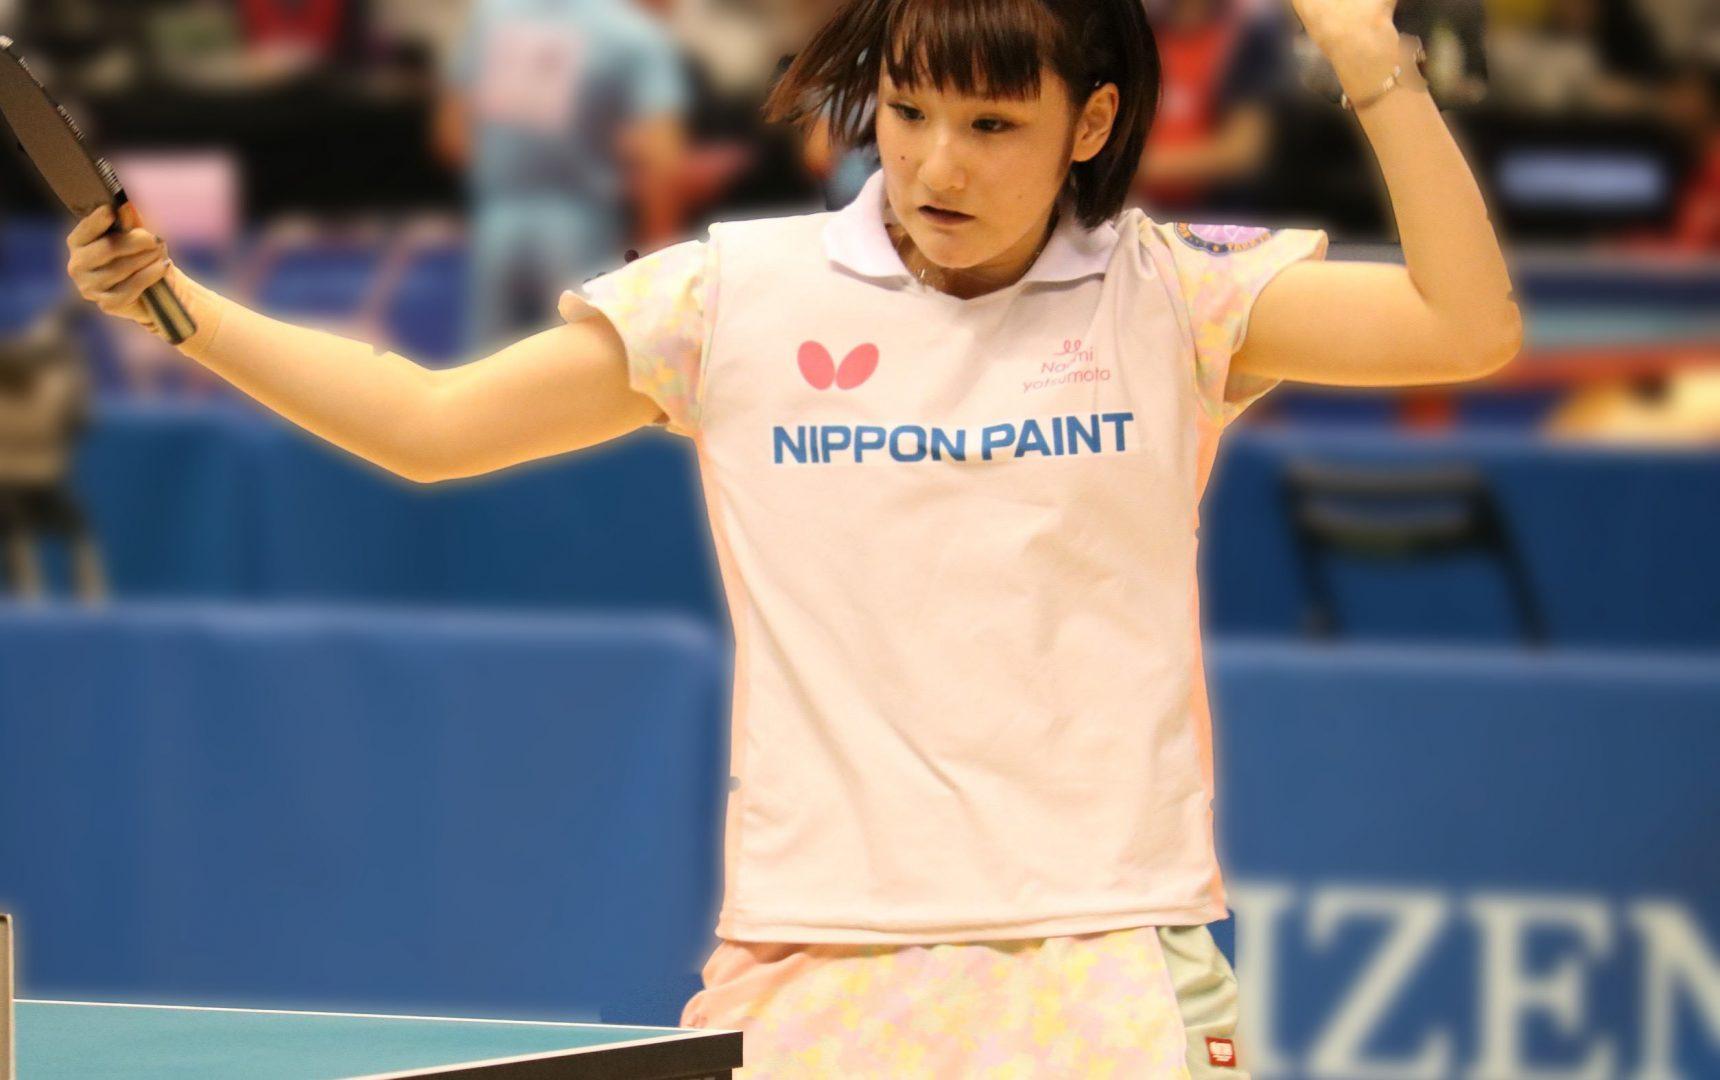 【Tリーグ】日本ペイントのチーム愛称が「日本ペイントマレッツ」に決定!